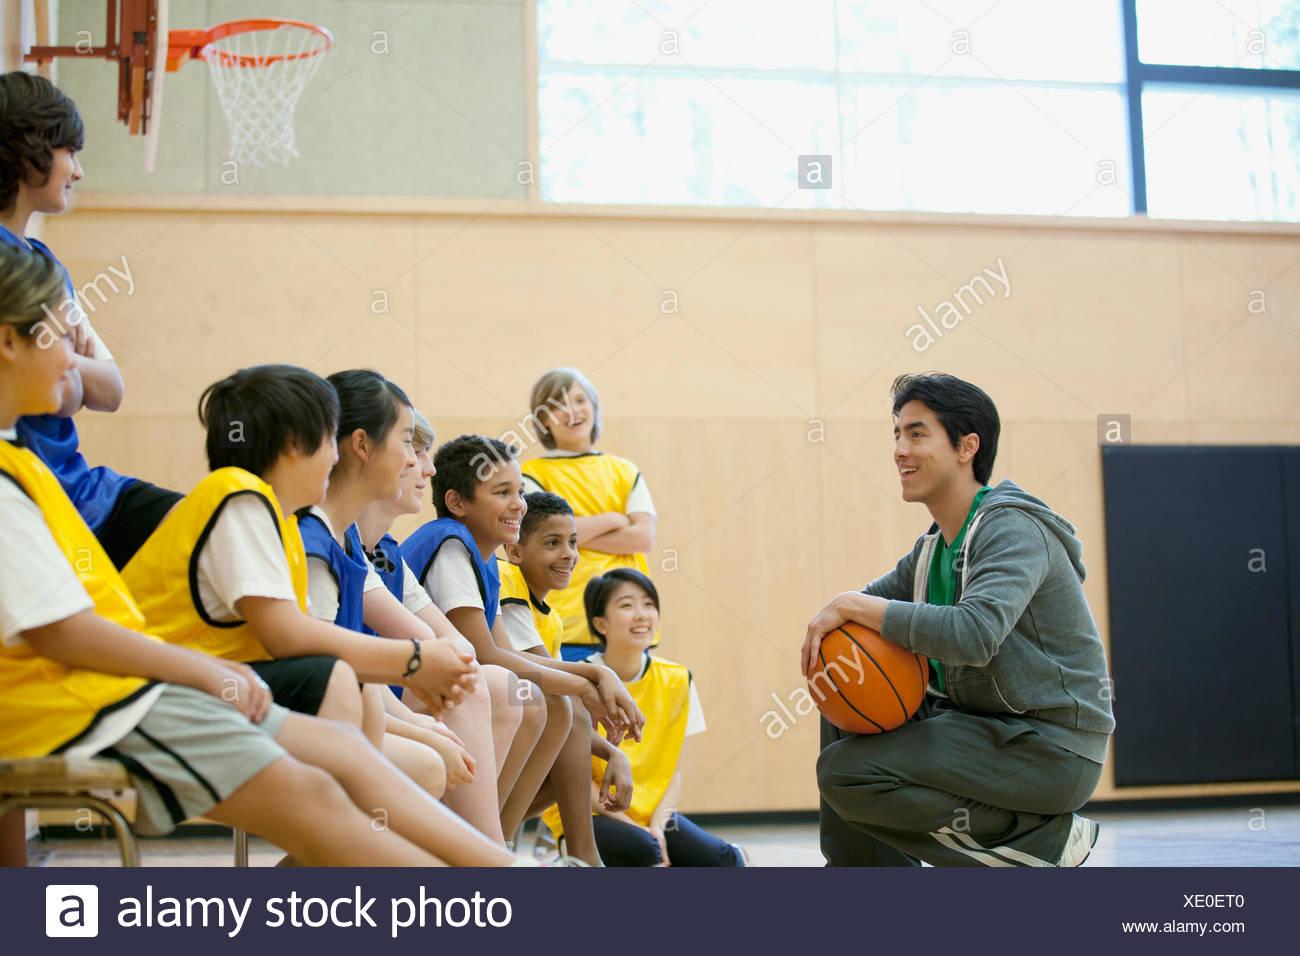 teacher instructing students on basketball - Stock Image